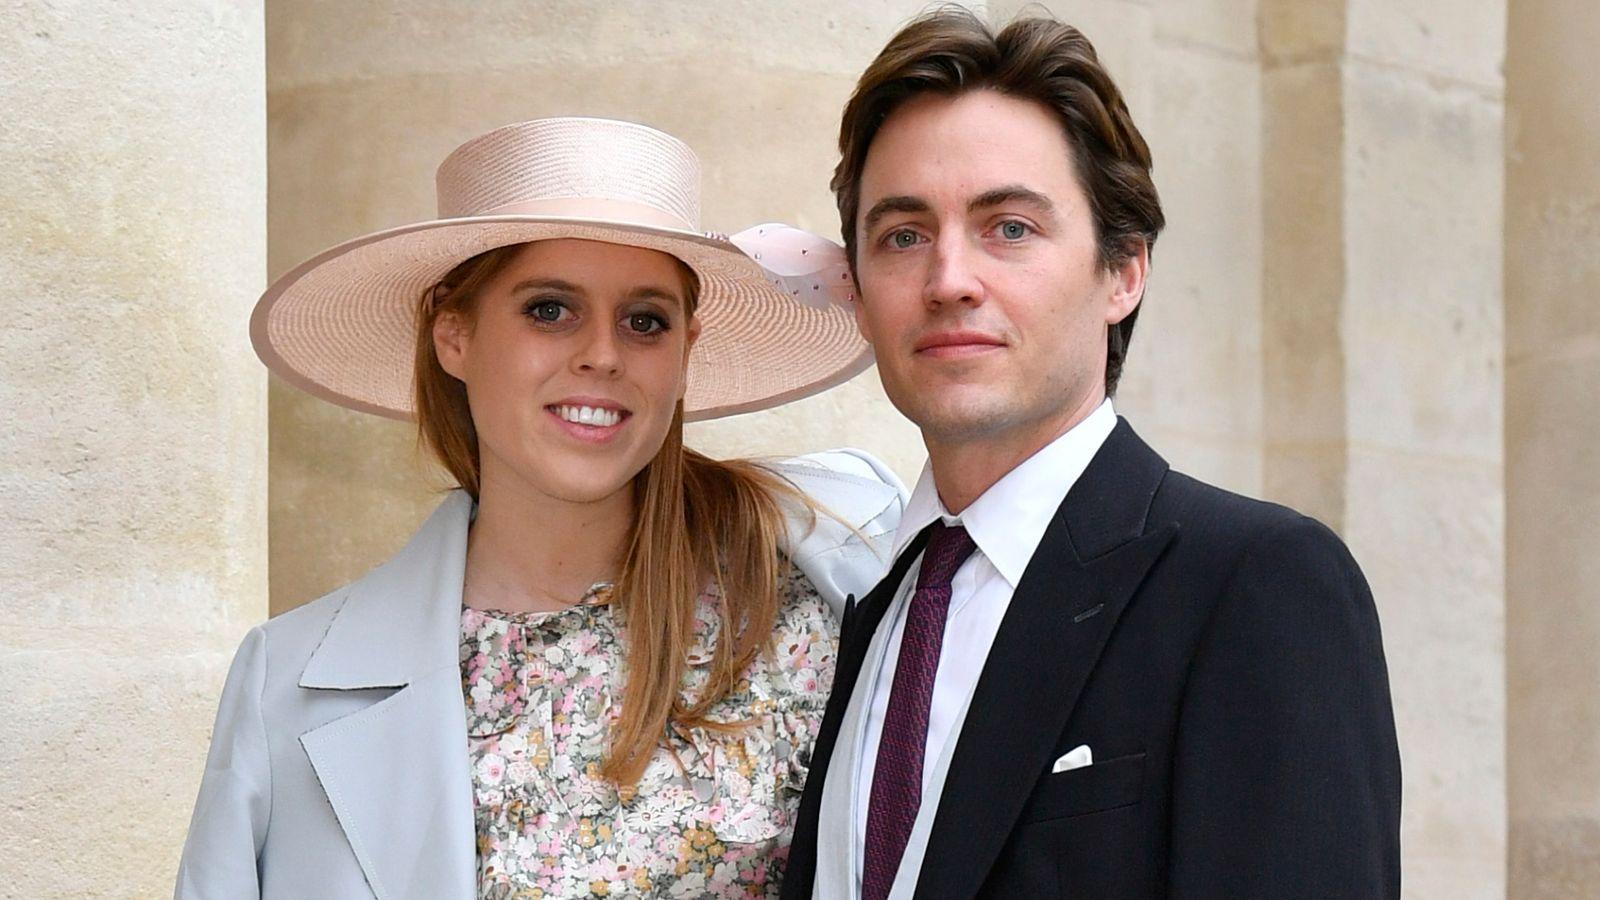 Coronavirus: Princess Beatrice cancels Buckingham Palace wedding ...